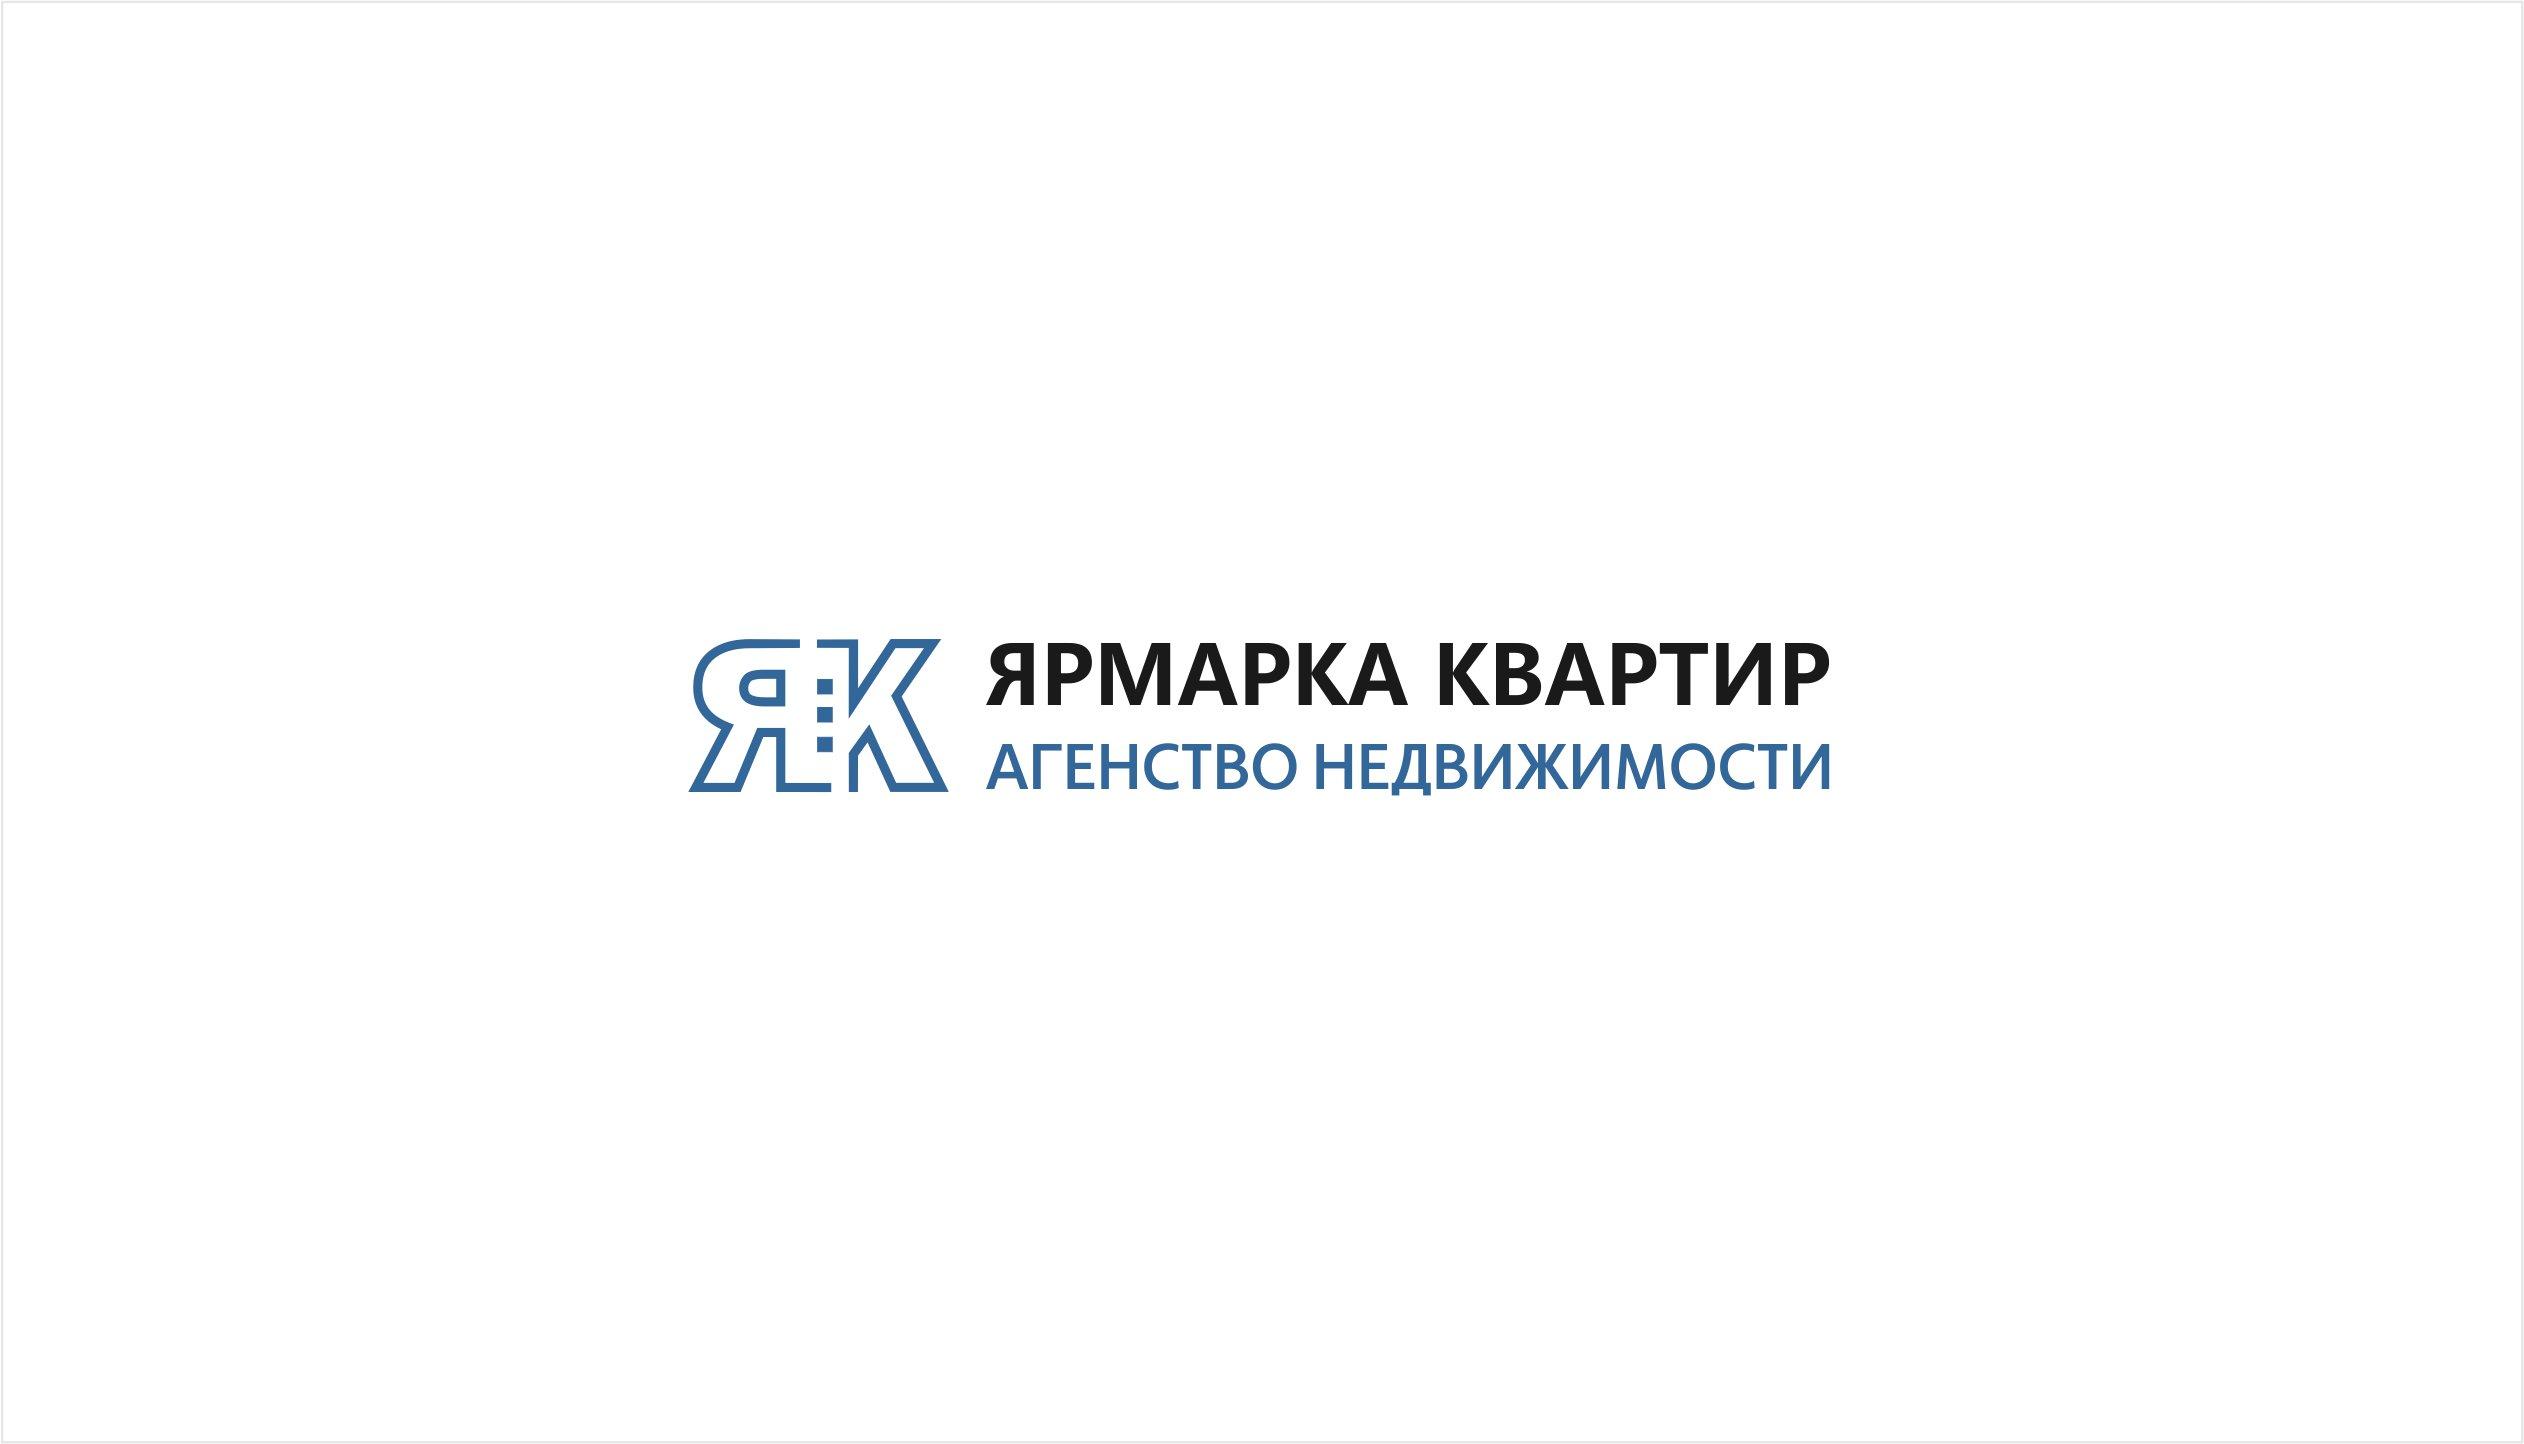 Создание логотипа, с вариантами для визитки и листовки фото f_717600b38db09a7c.jpg